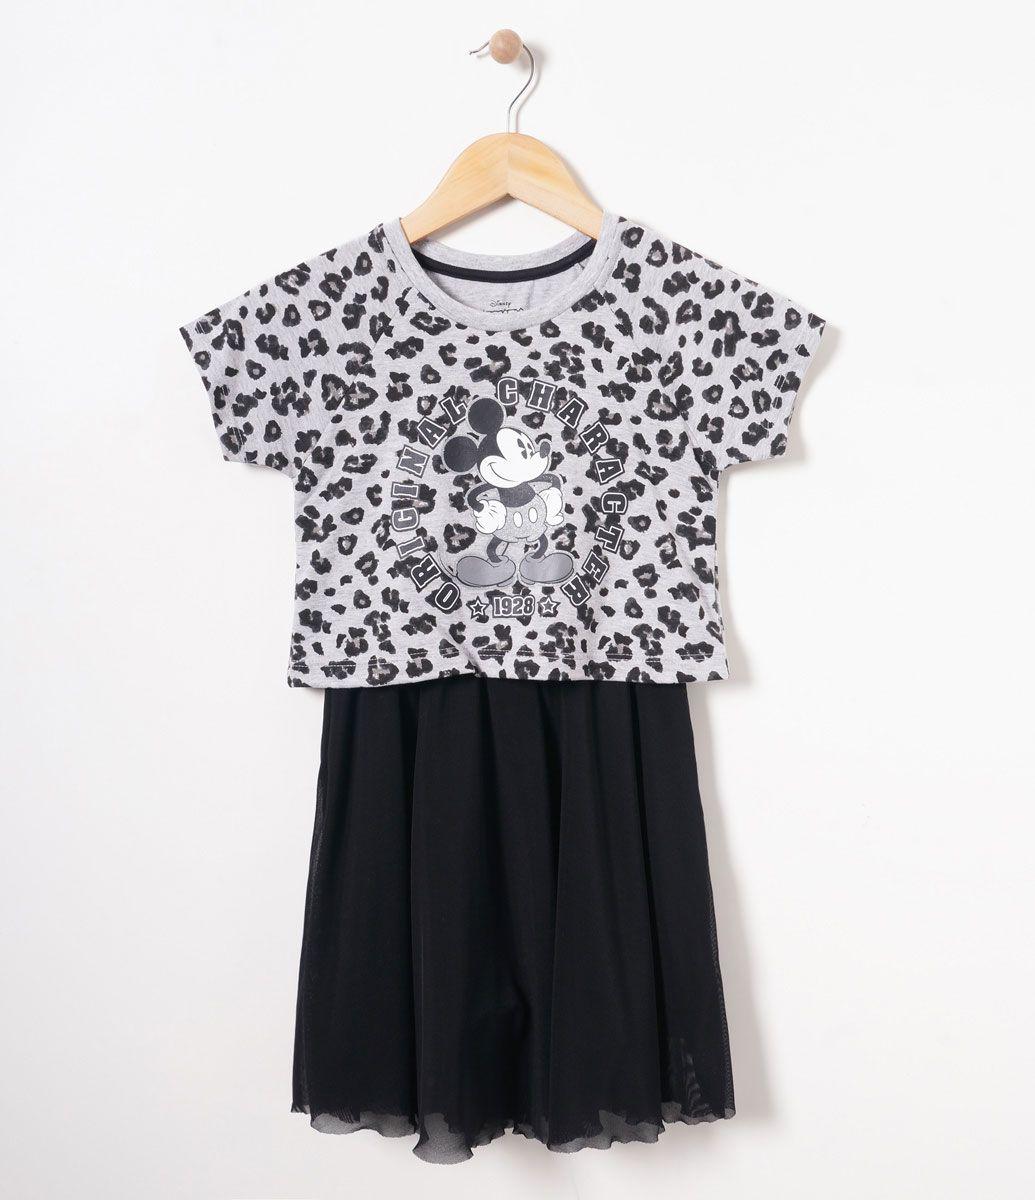 ddddfcc05d Vestido infantil Manga curta Gola redonda Estampado Com recortes laterais  Marca  Mickey Mouse Tecido